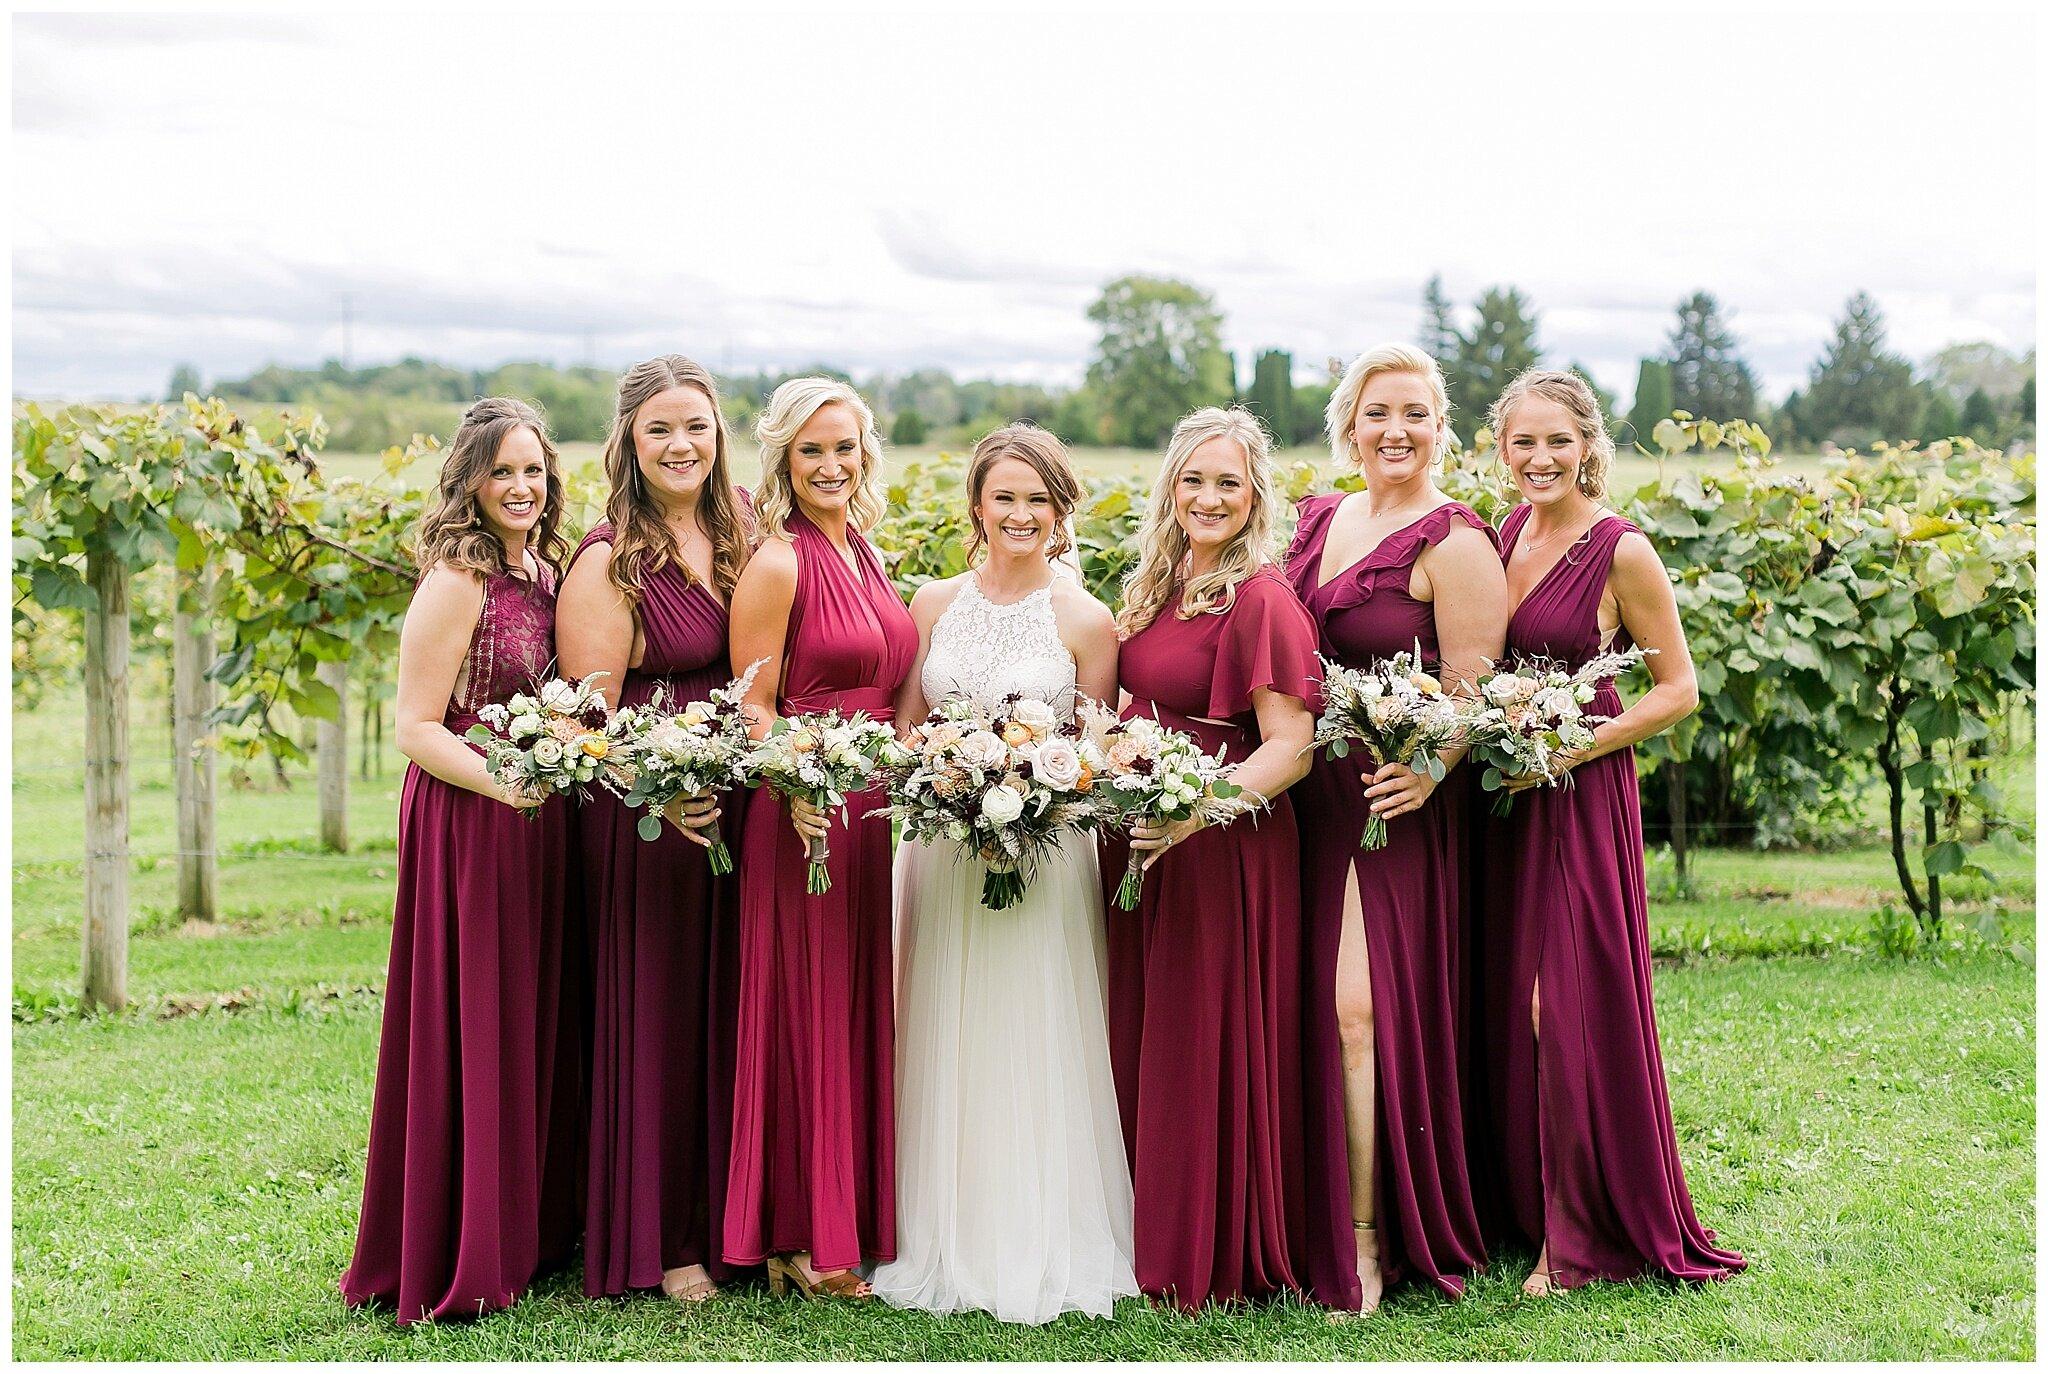 over_the_vines_edgerton_wisconsin_wedding_madison_wisconsin_photographer_0445.jpg